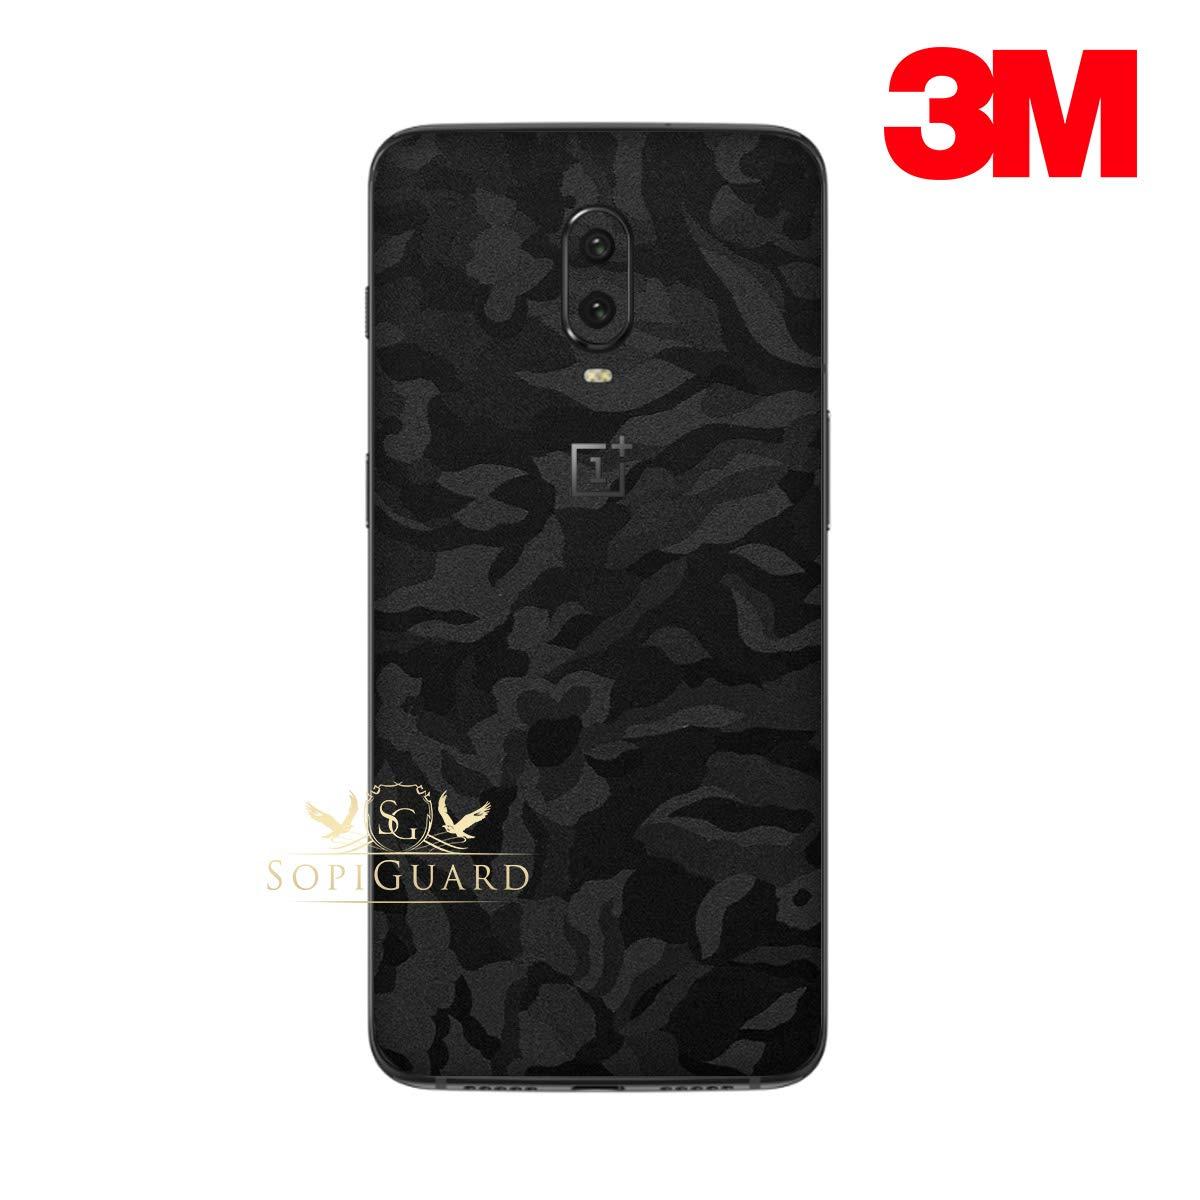 Skin Para Oneplus 6t 3m Black Camo